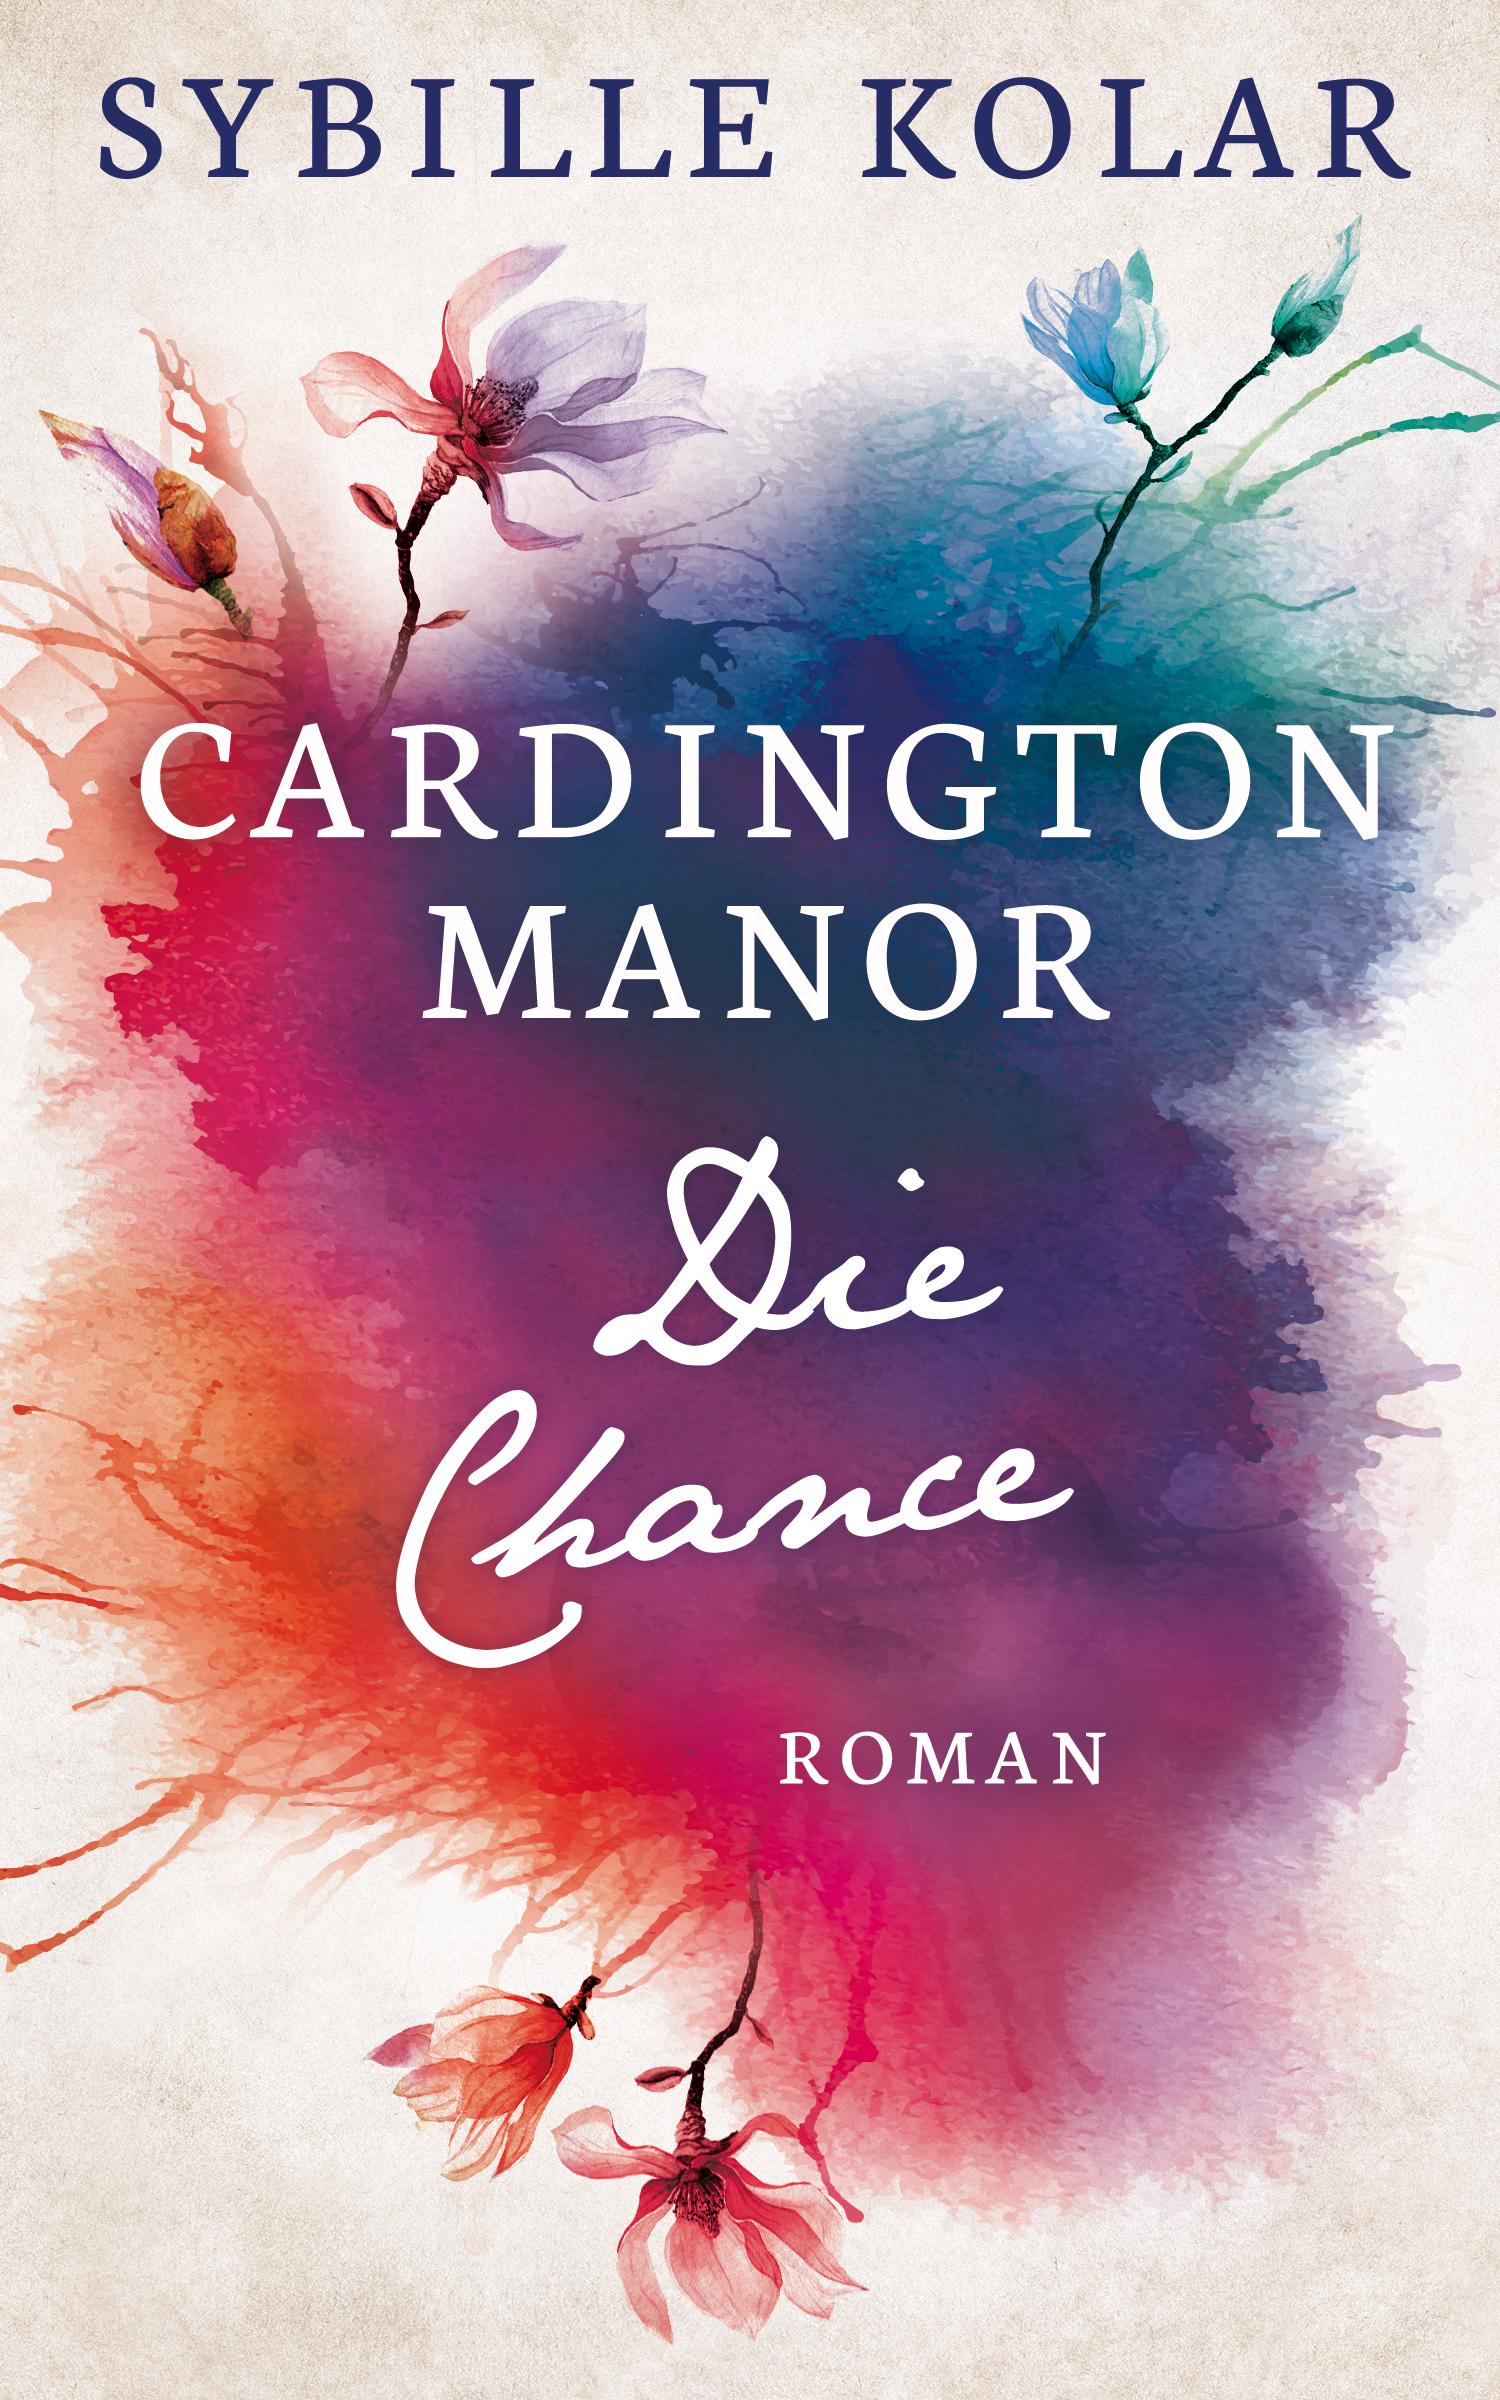 Sybille Kolar – Die Chance (CARDINGTON MANOR 6)